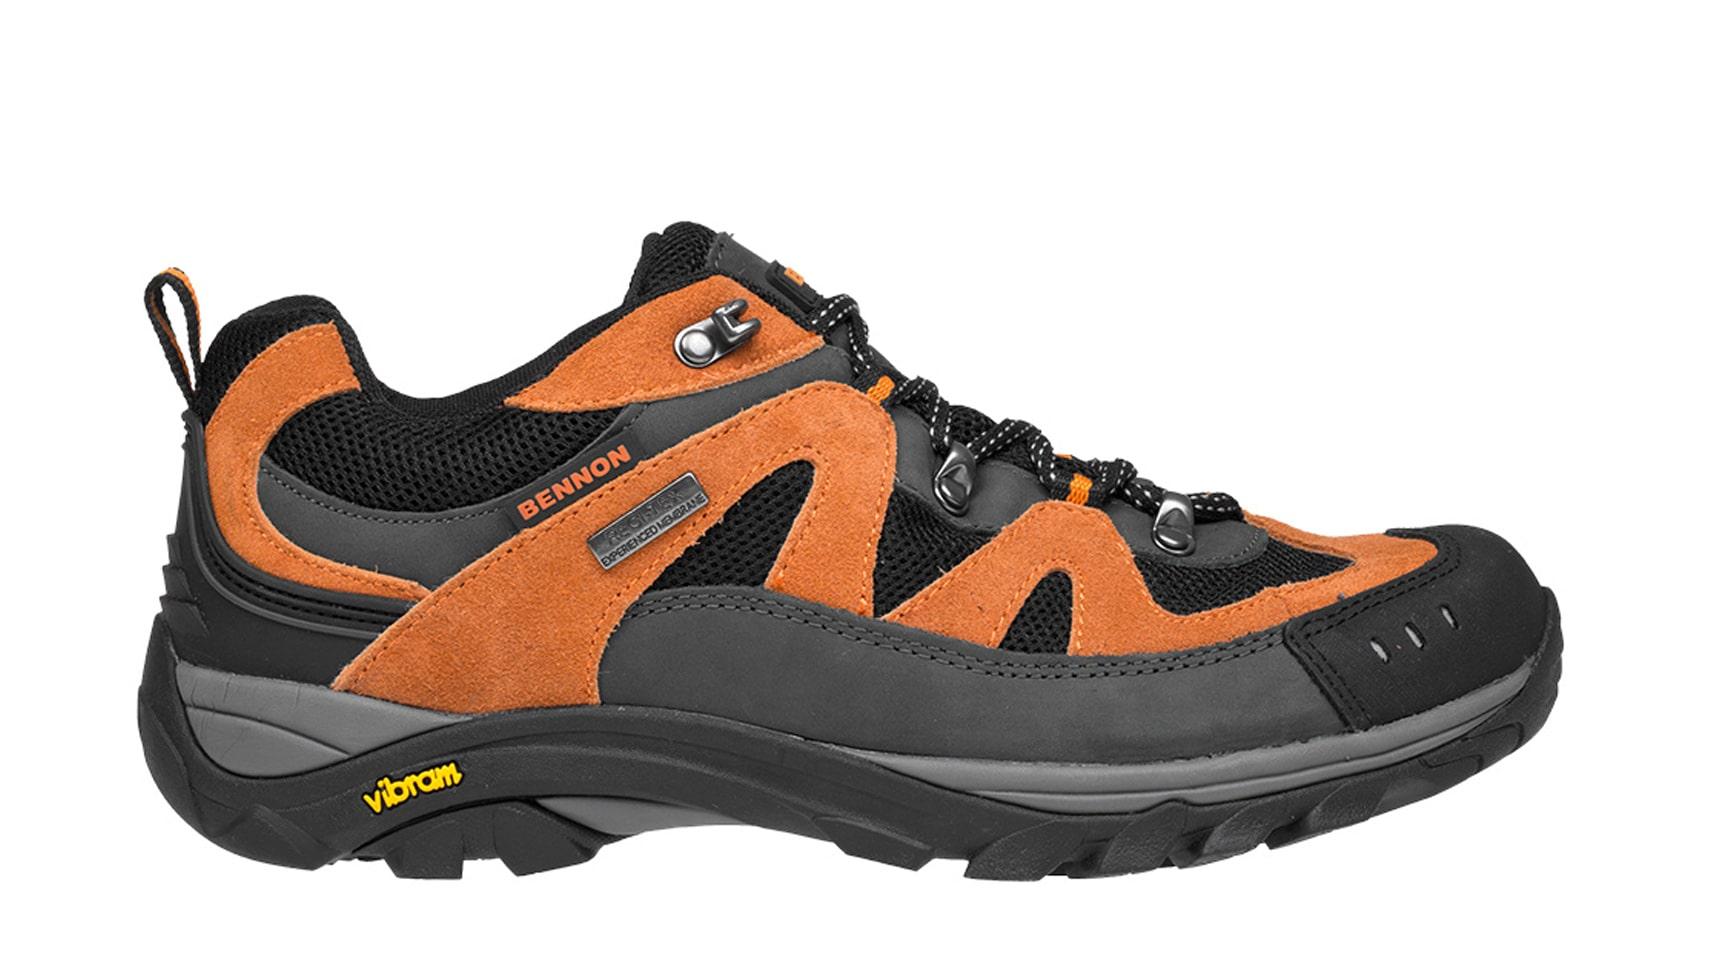 Туристически обувки Bennon Emperado